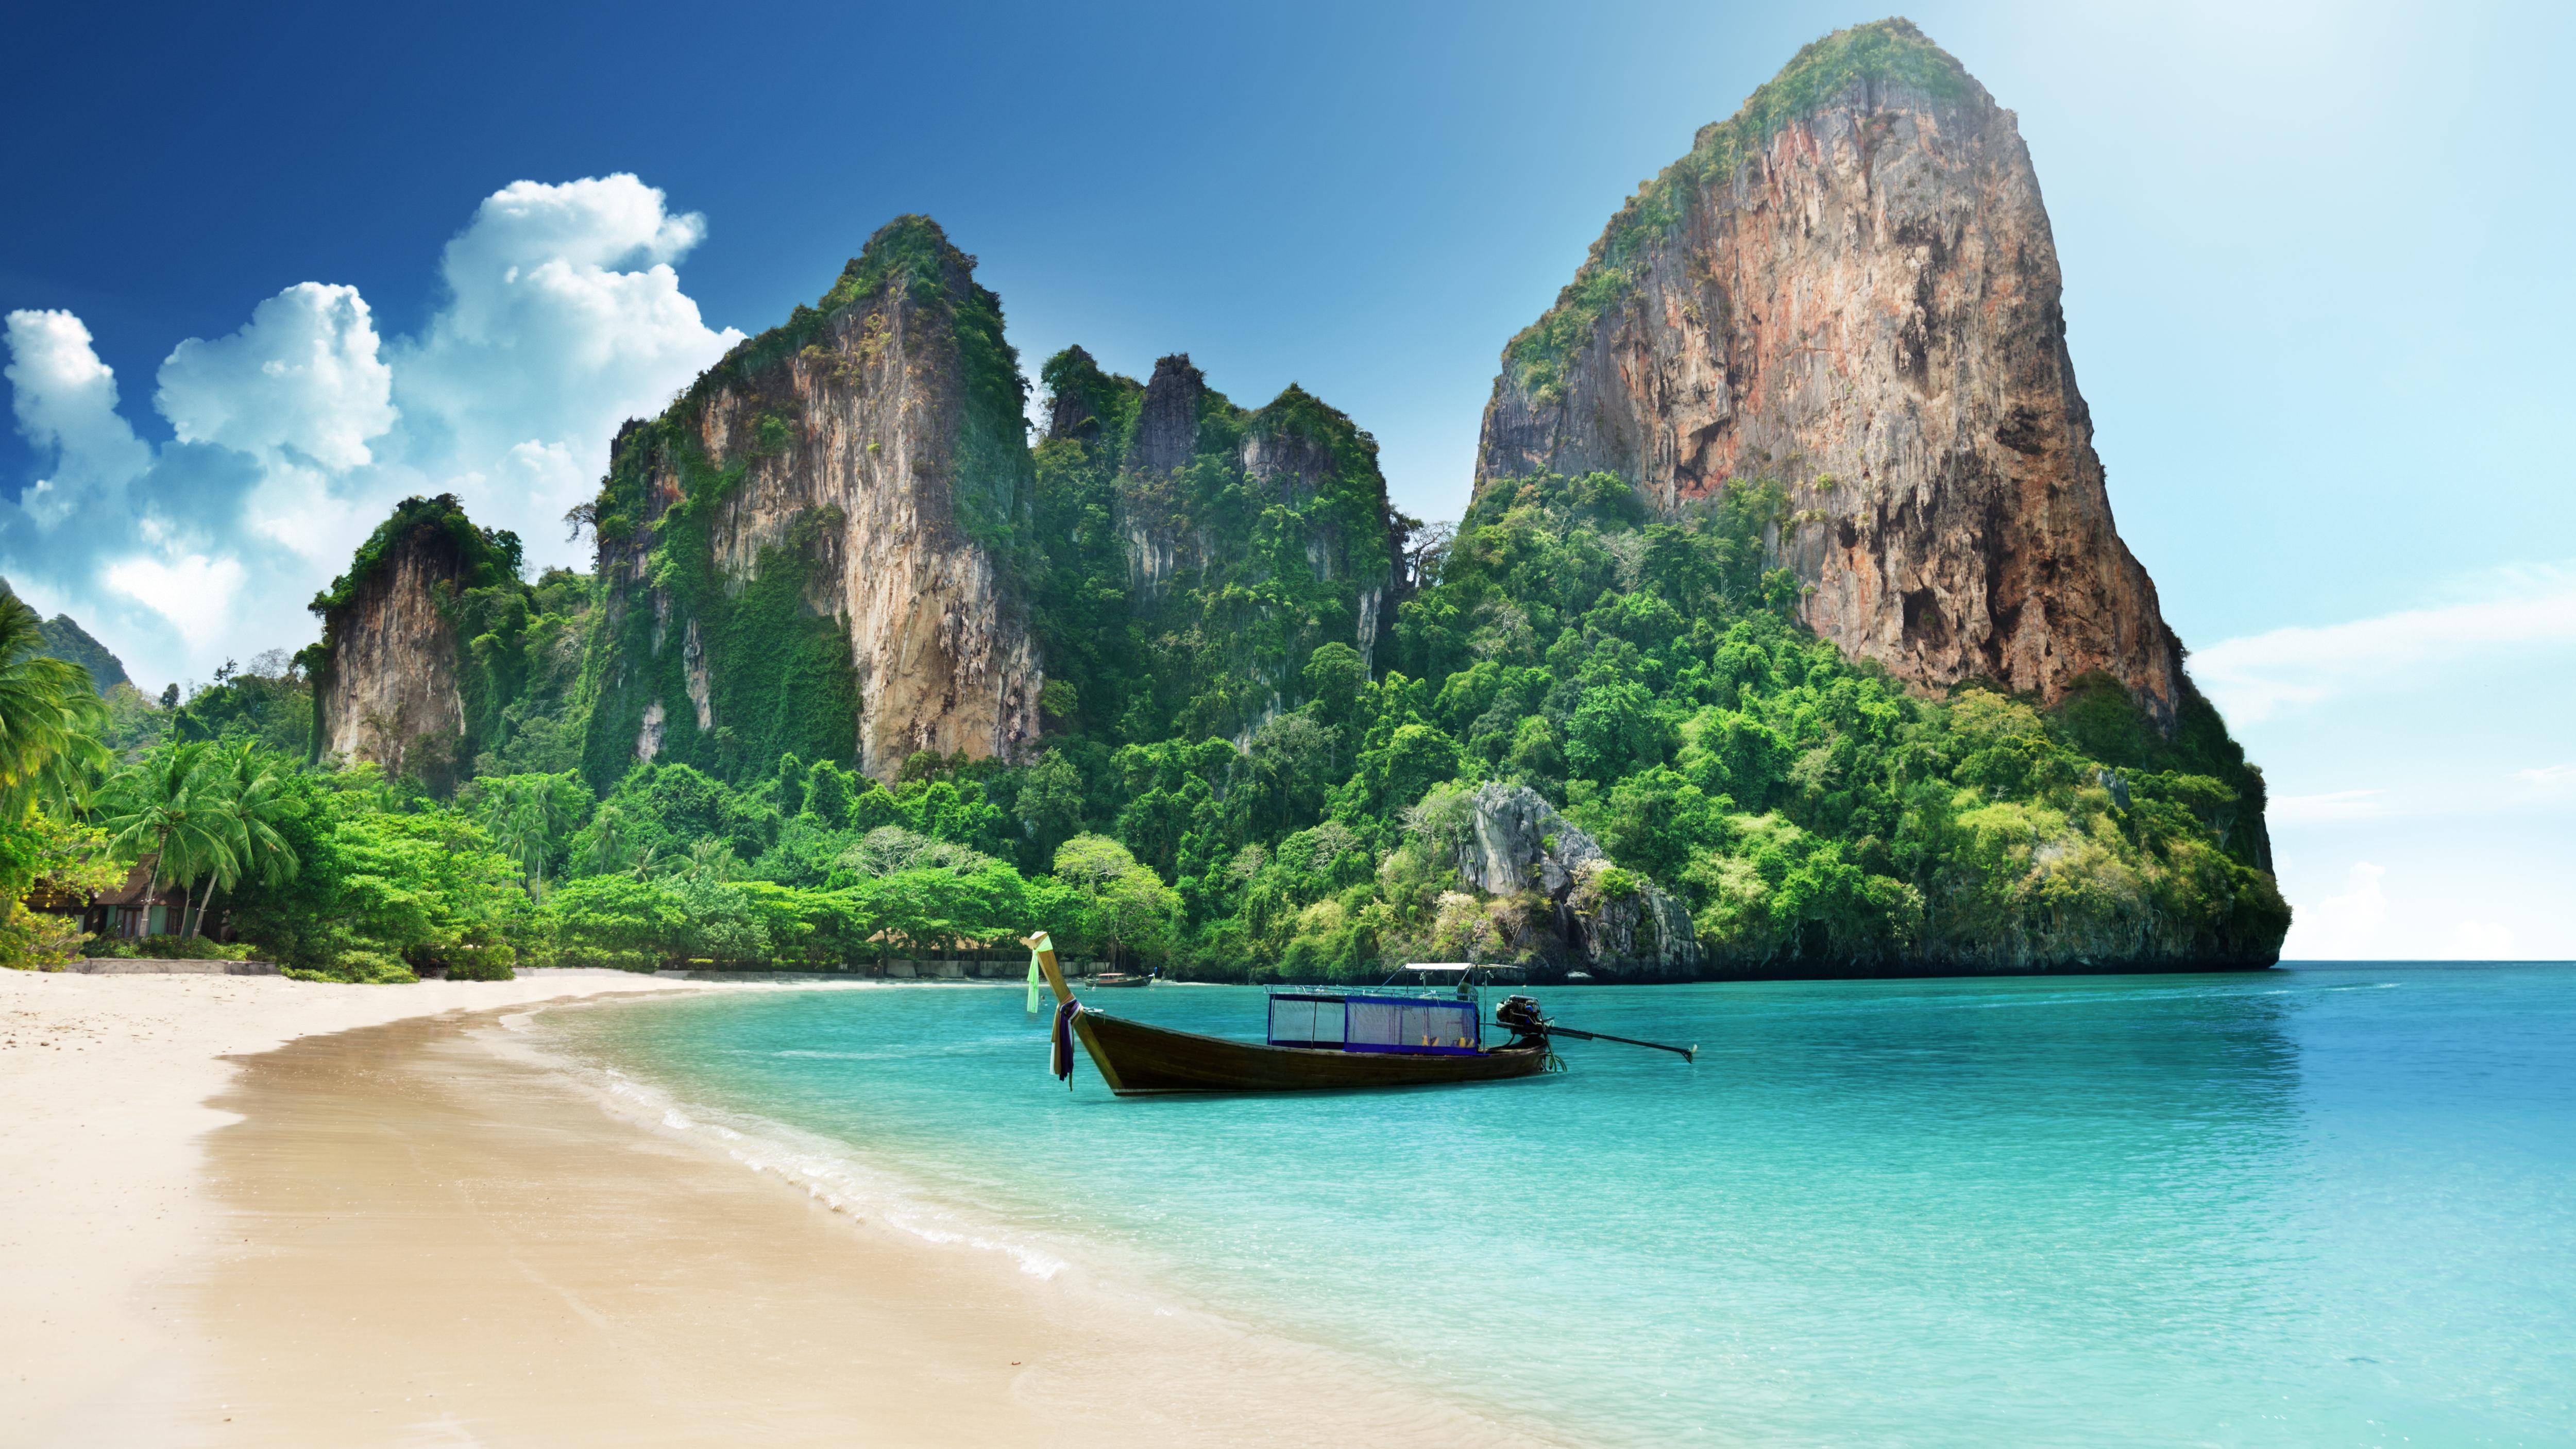 Tropical Beach - Tropical Beach Desktop Background - HD Wallpaper